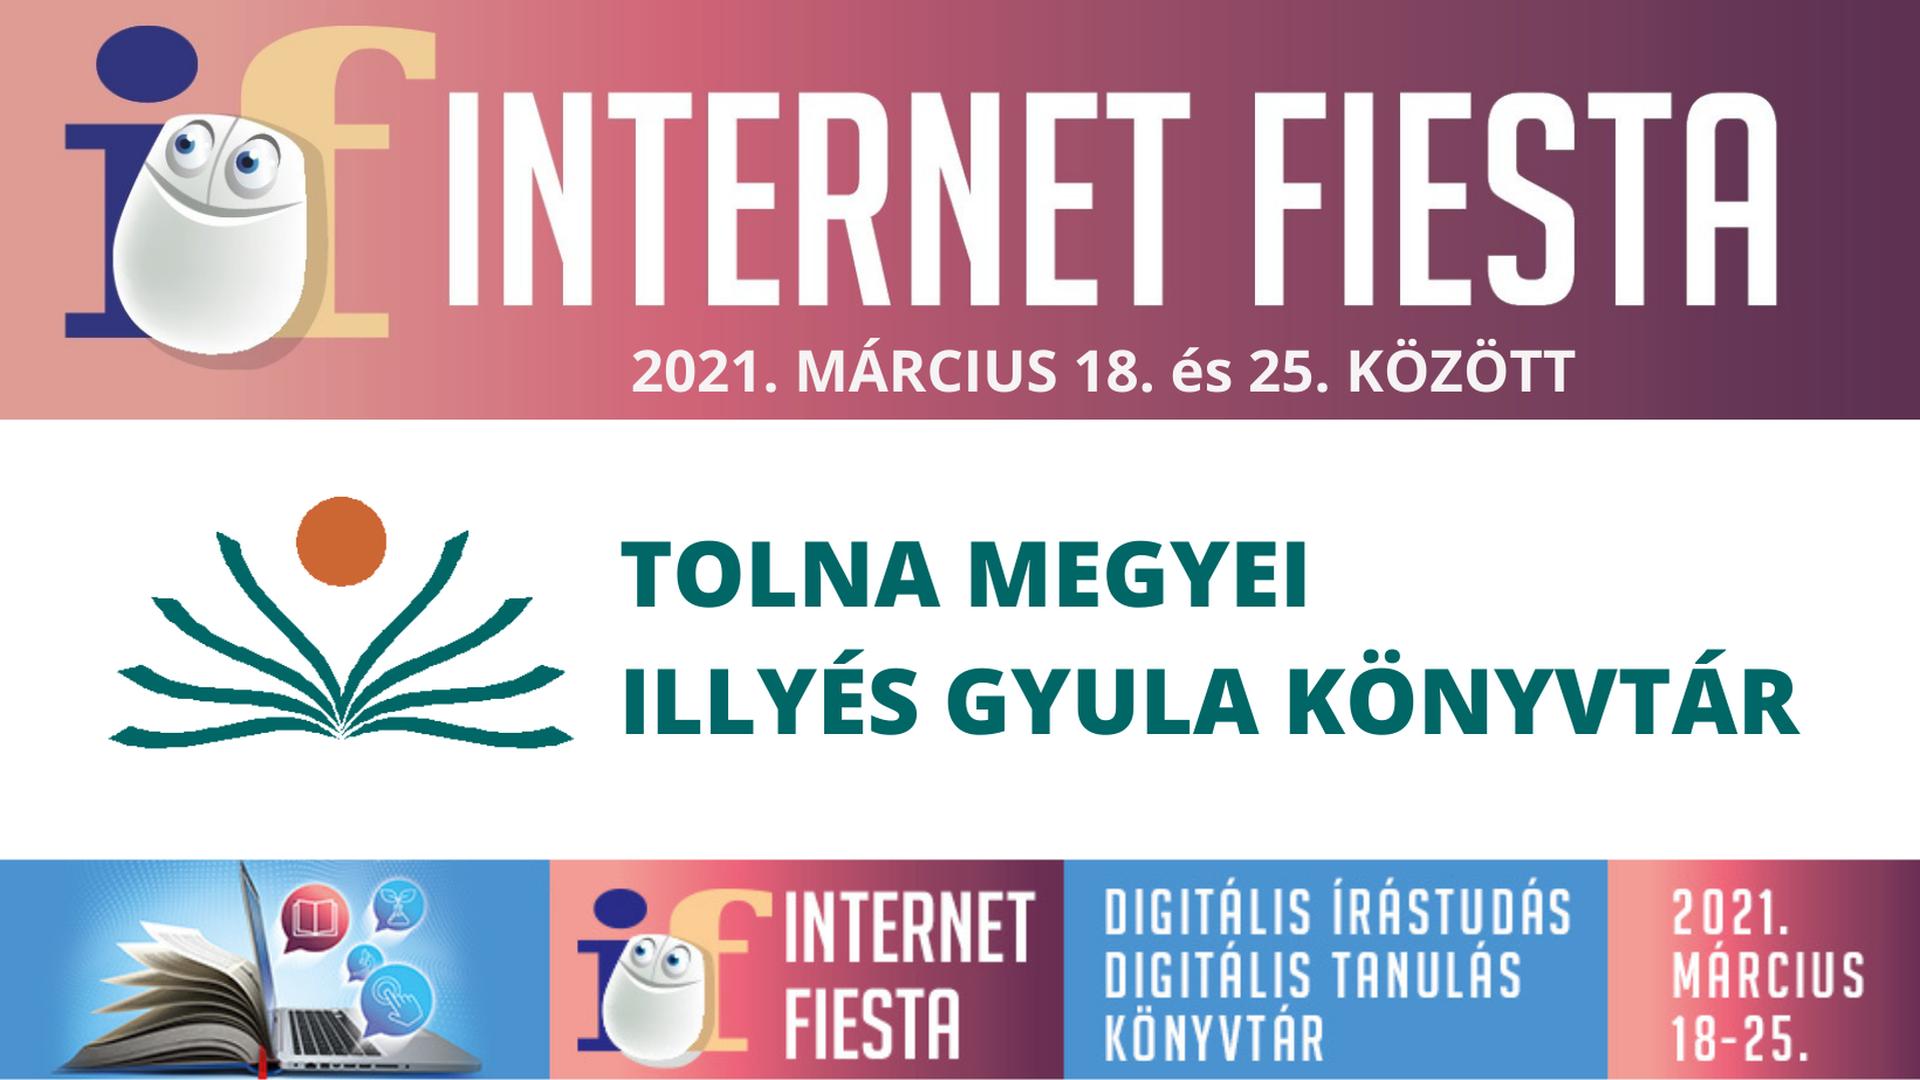 Internet Fiesta 2021. március 18-25.